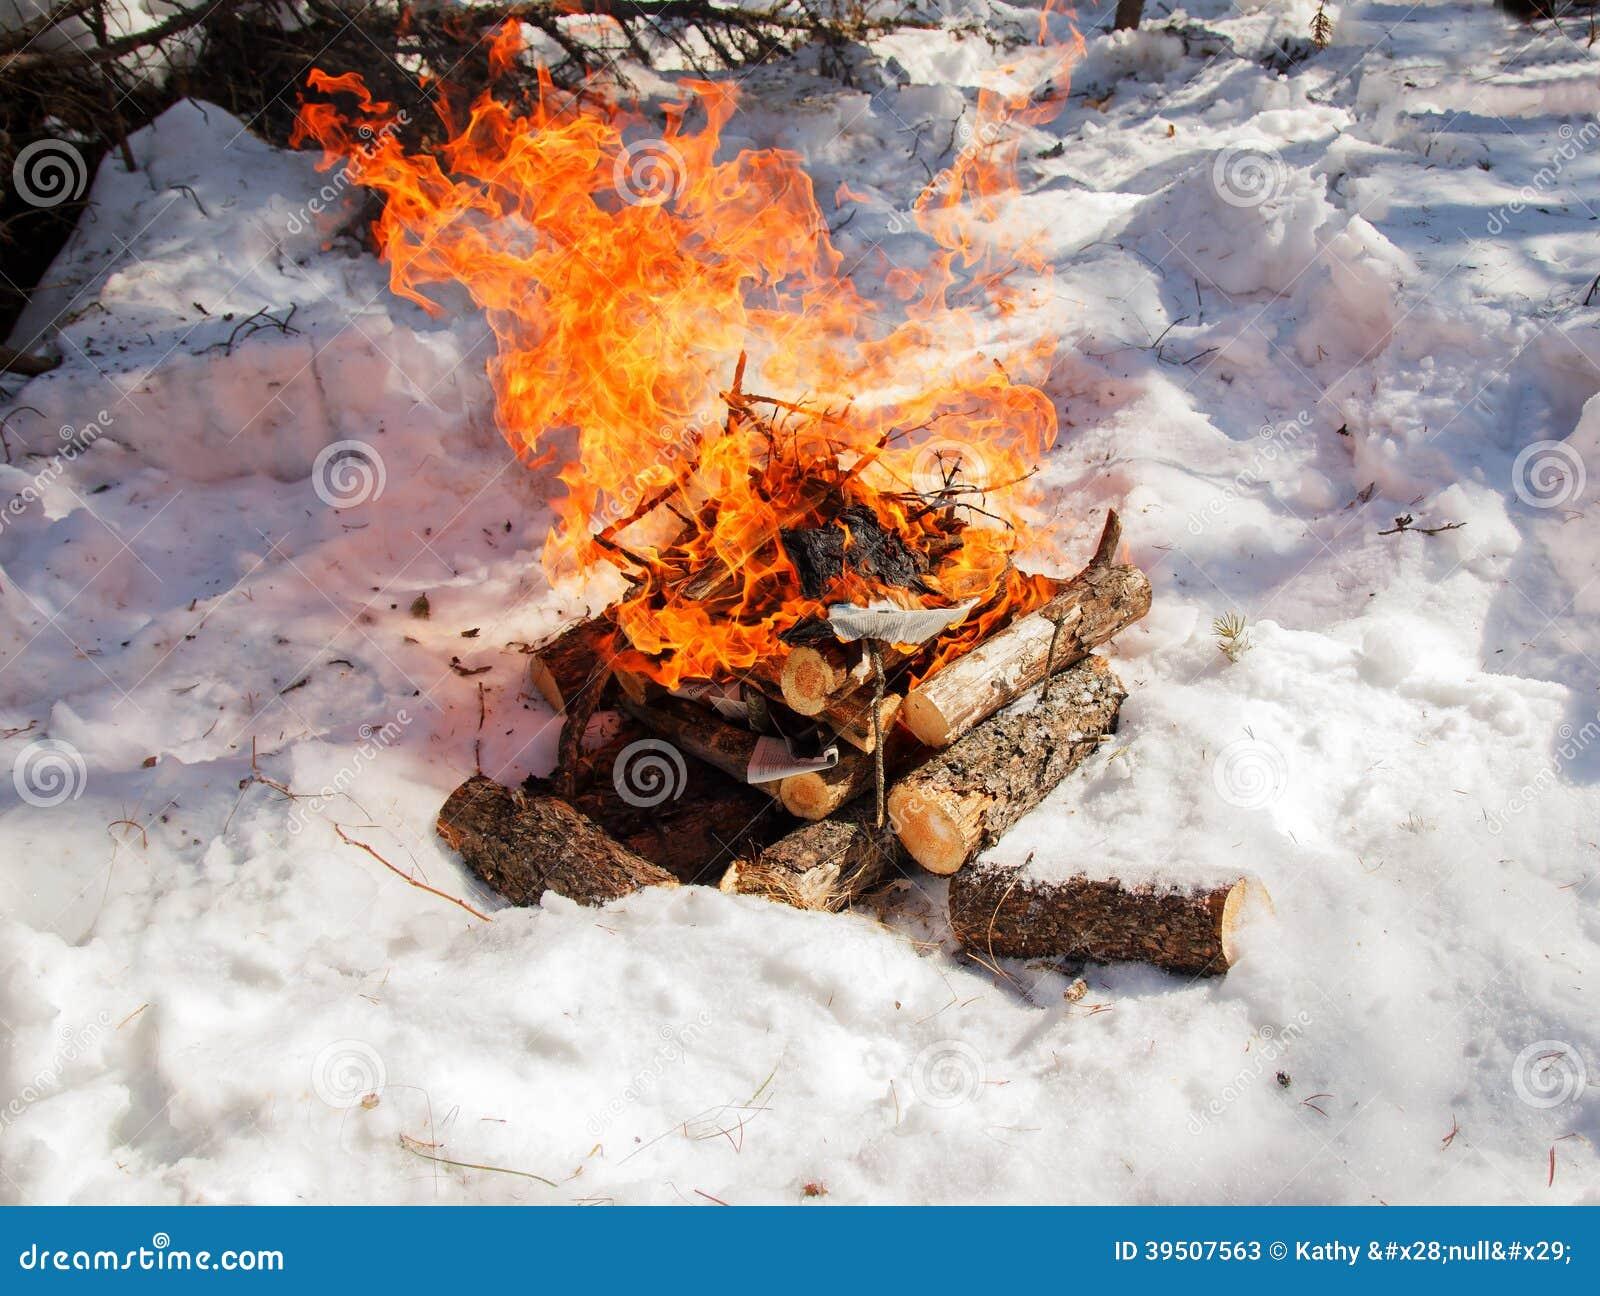 Bonfire on snow